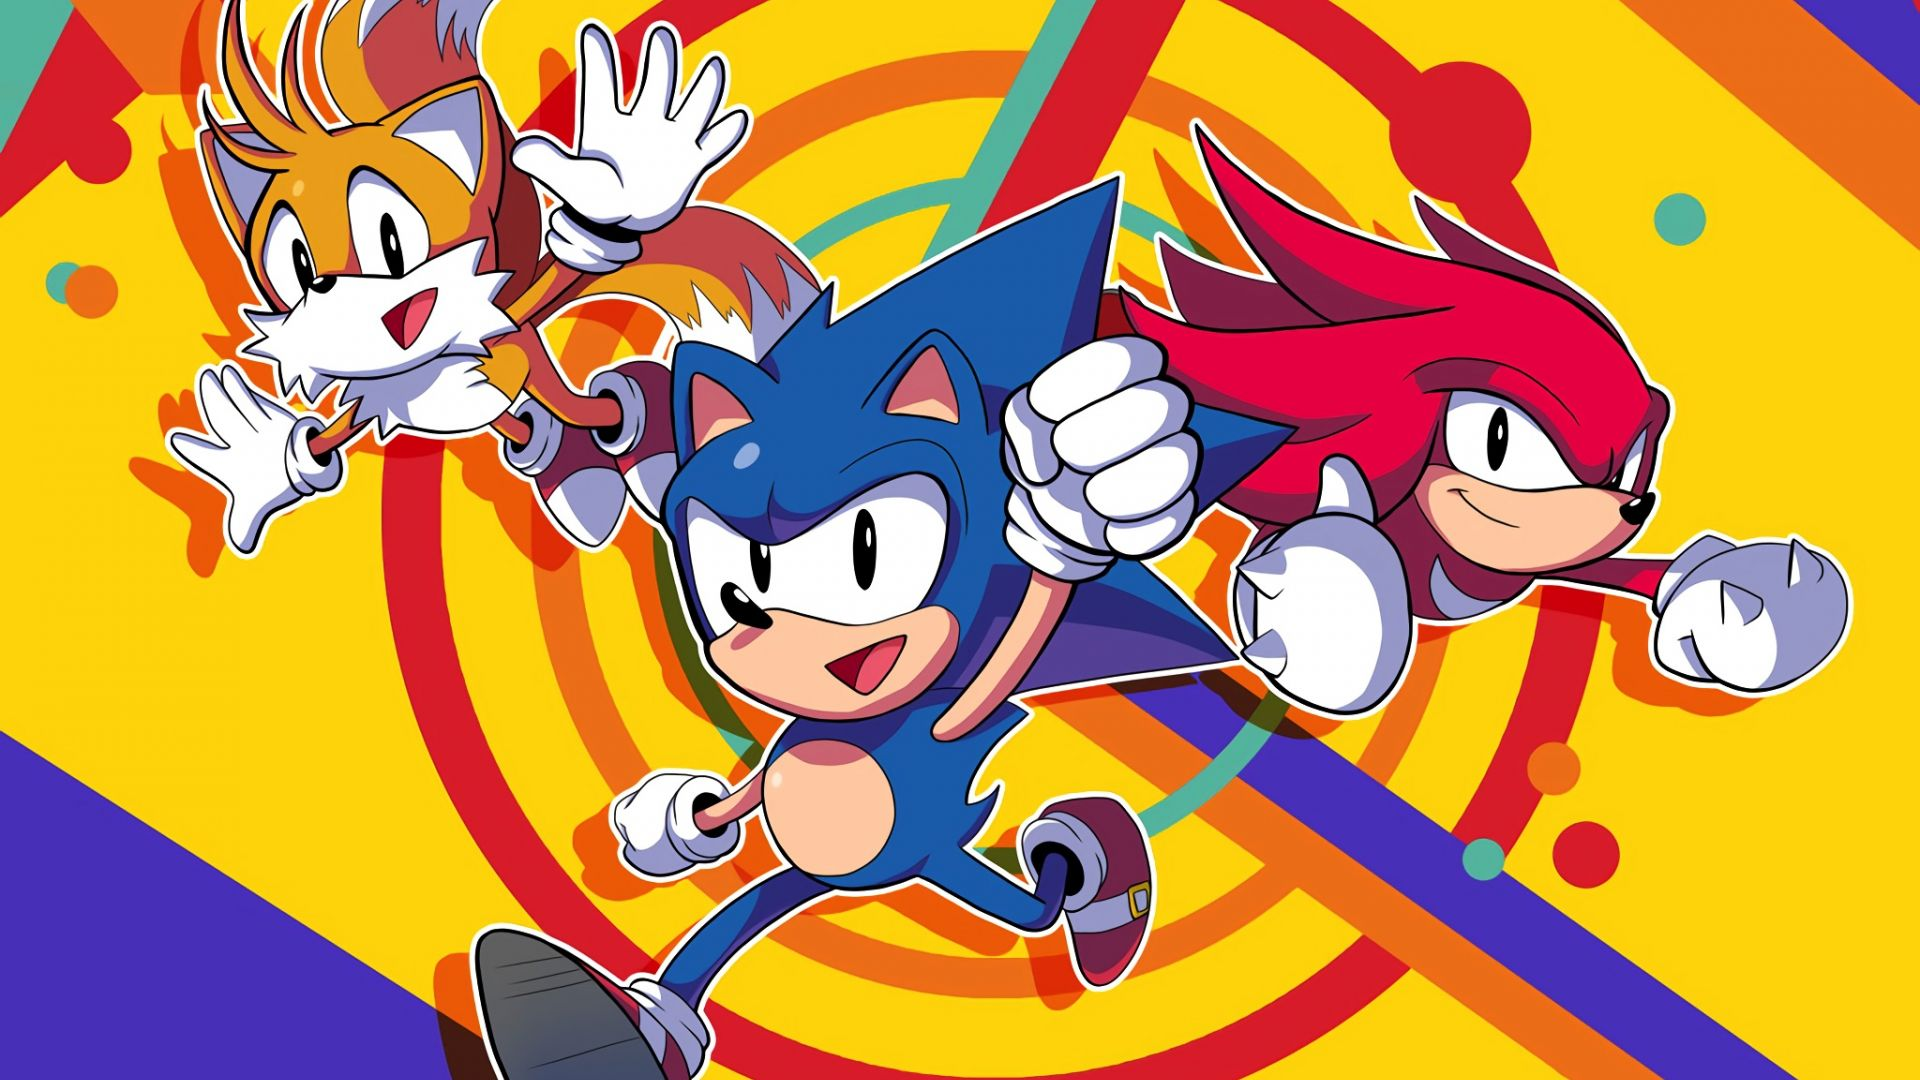 Desktop Wallpaper Sonic Mania, Fun, Video Game, Hd Image ...